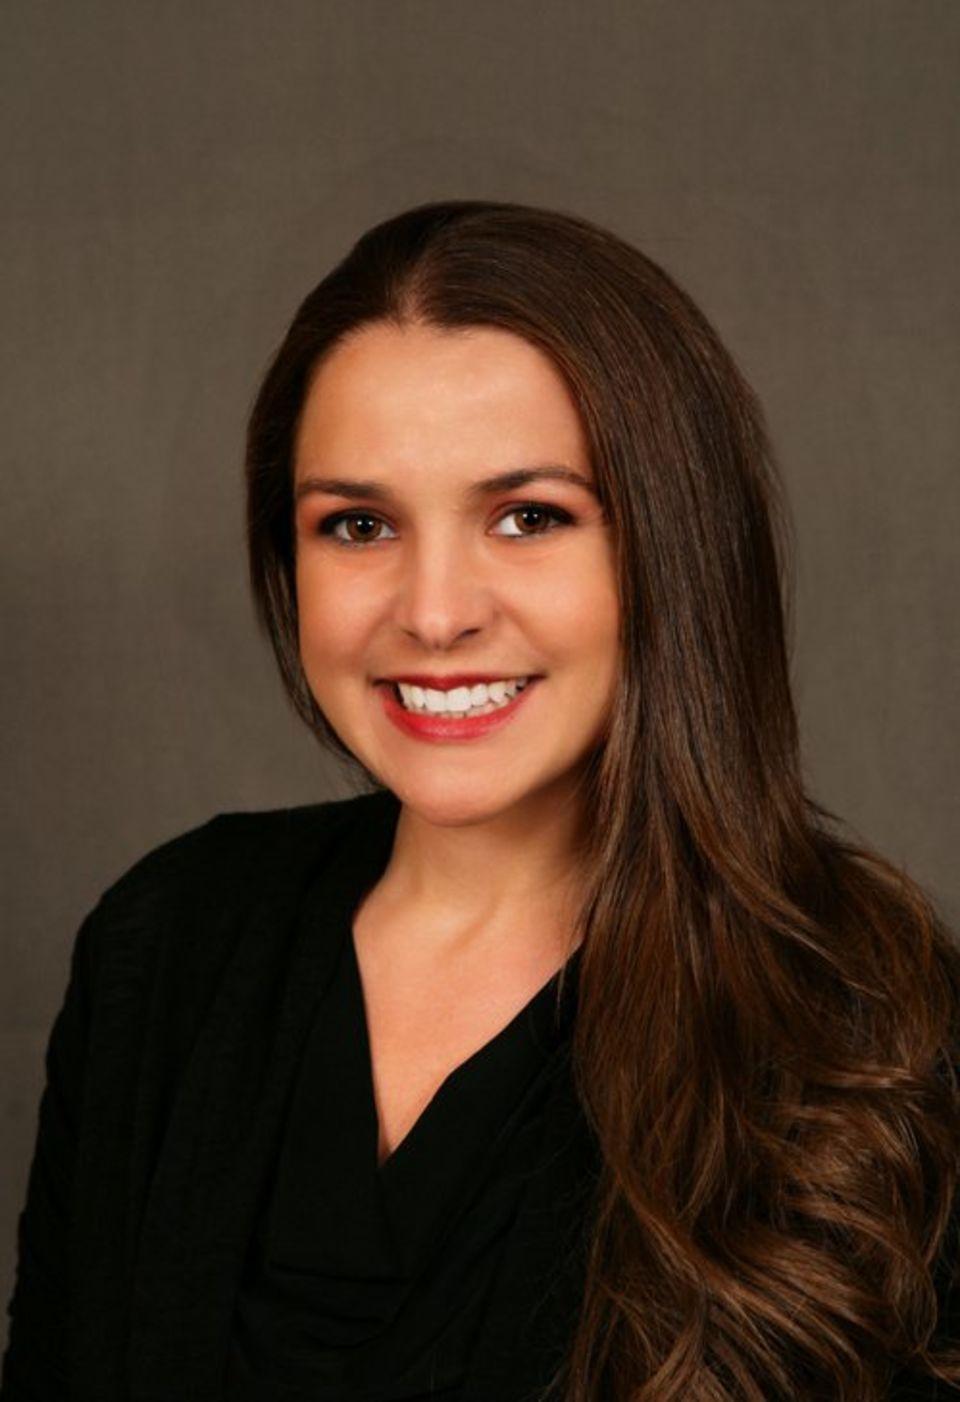 Janielle Silliman, DMD